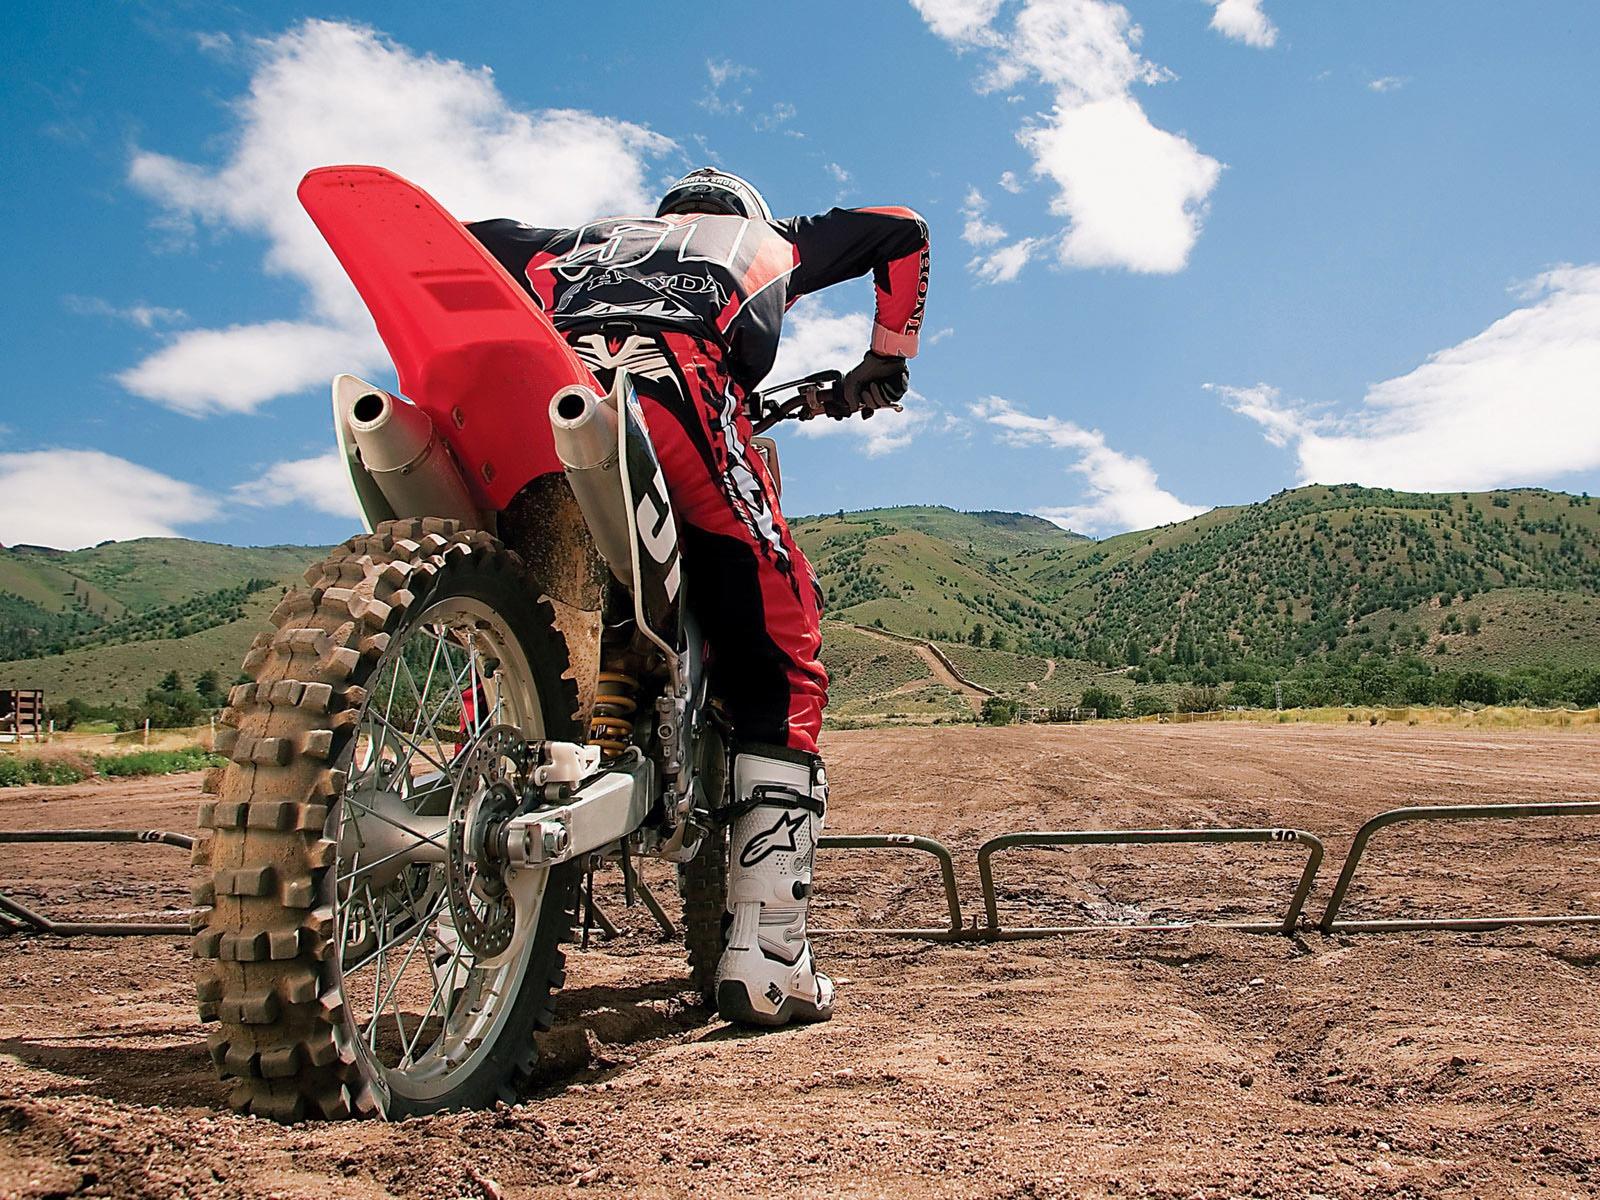 http://1.bp.blogspot.com/-fI7WA6S49kI/Ty0juAtw72I/AAAAAAAACAU/DjhC6LCDC-c/s1600/Motocross+Wallpaper+2.jpg